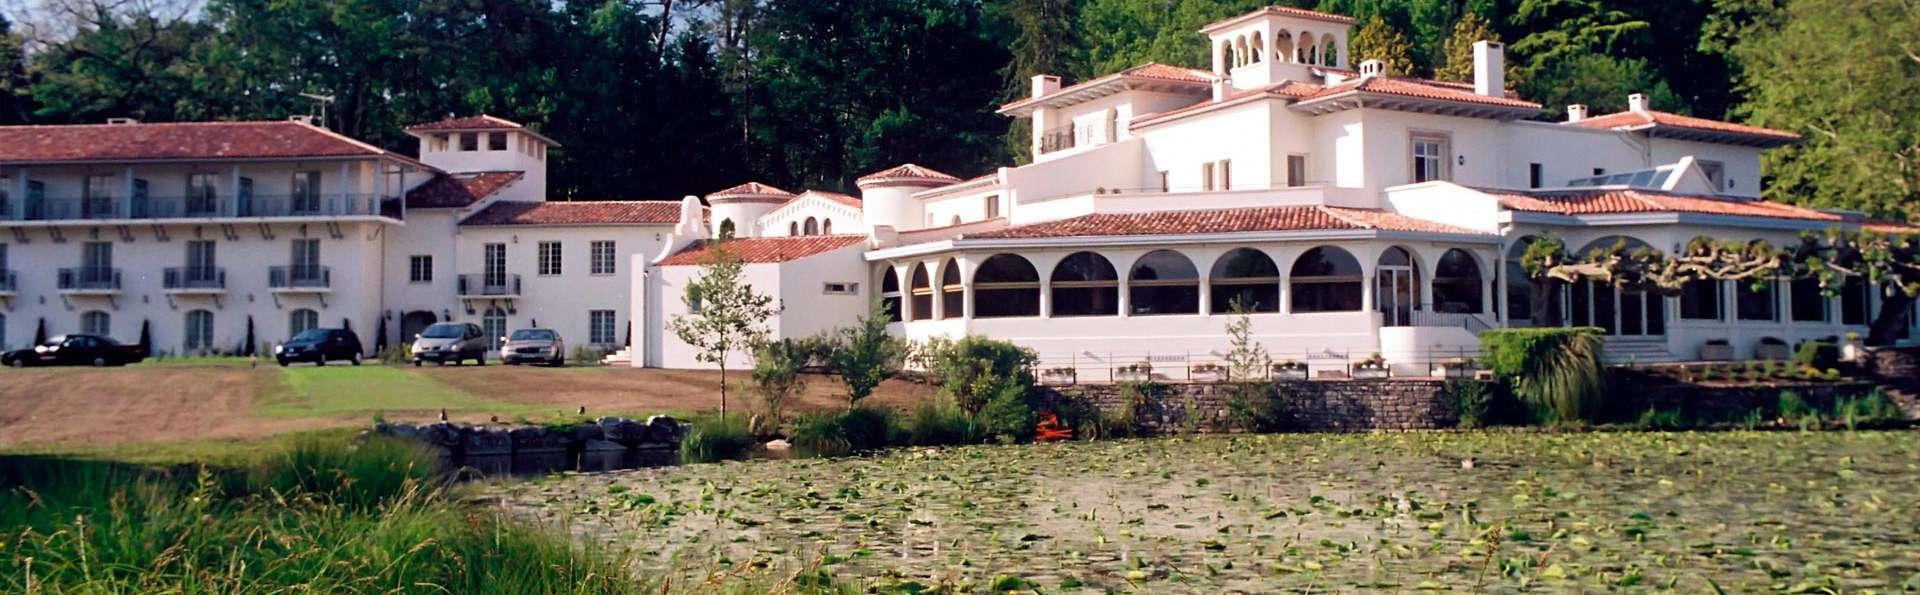 Château de Brindos - edit_front4.jpg